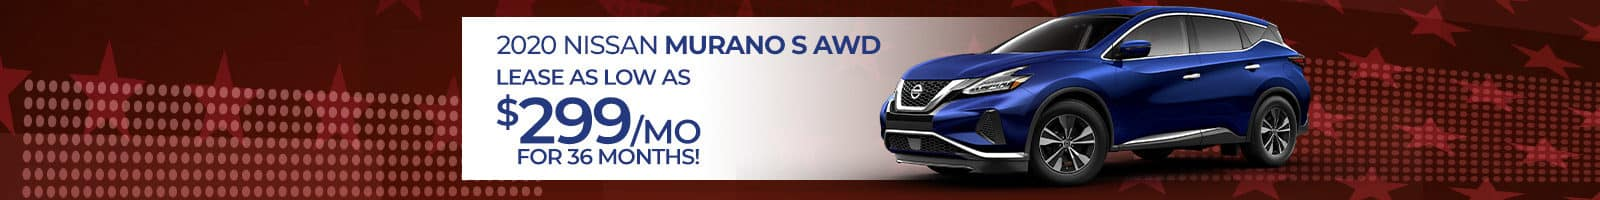 Best offer on a 2020 Nissan Murano near Clarksville IN